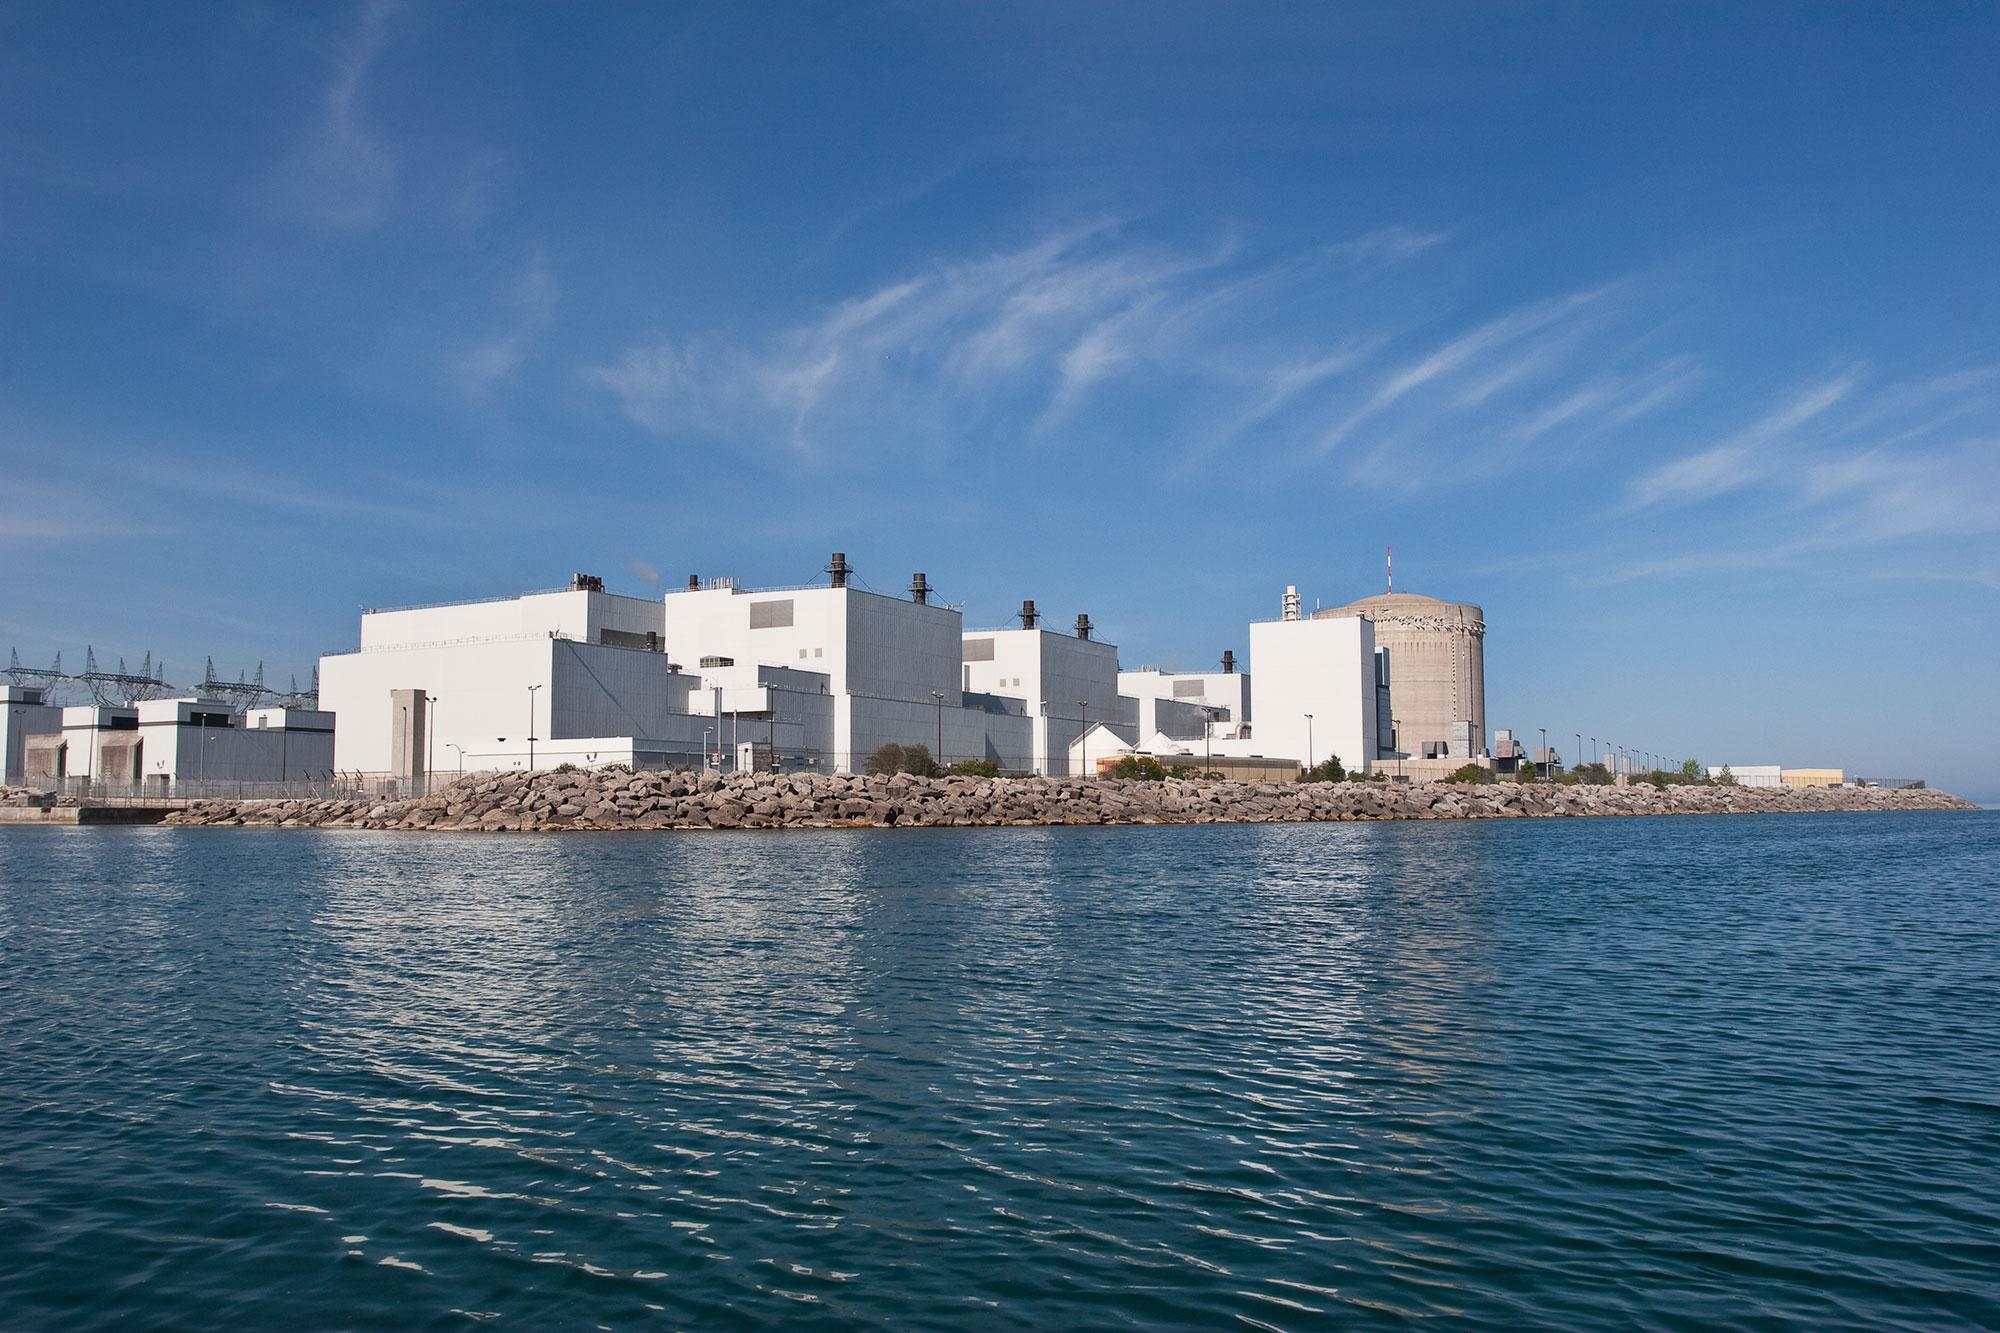 Darlington Nuclear Generating Station on the shores of Lake Ontario. (Photo via Greenpeace Canada)